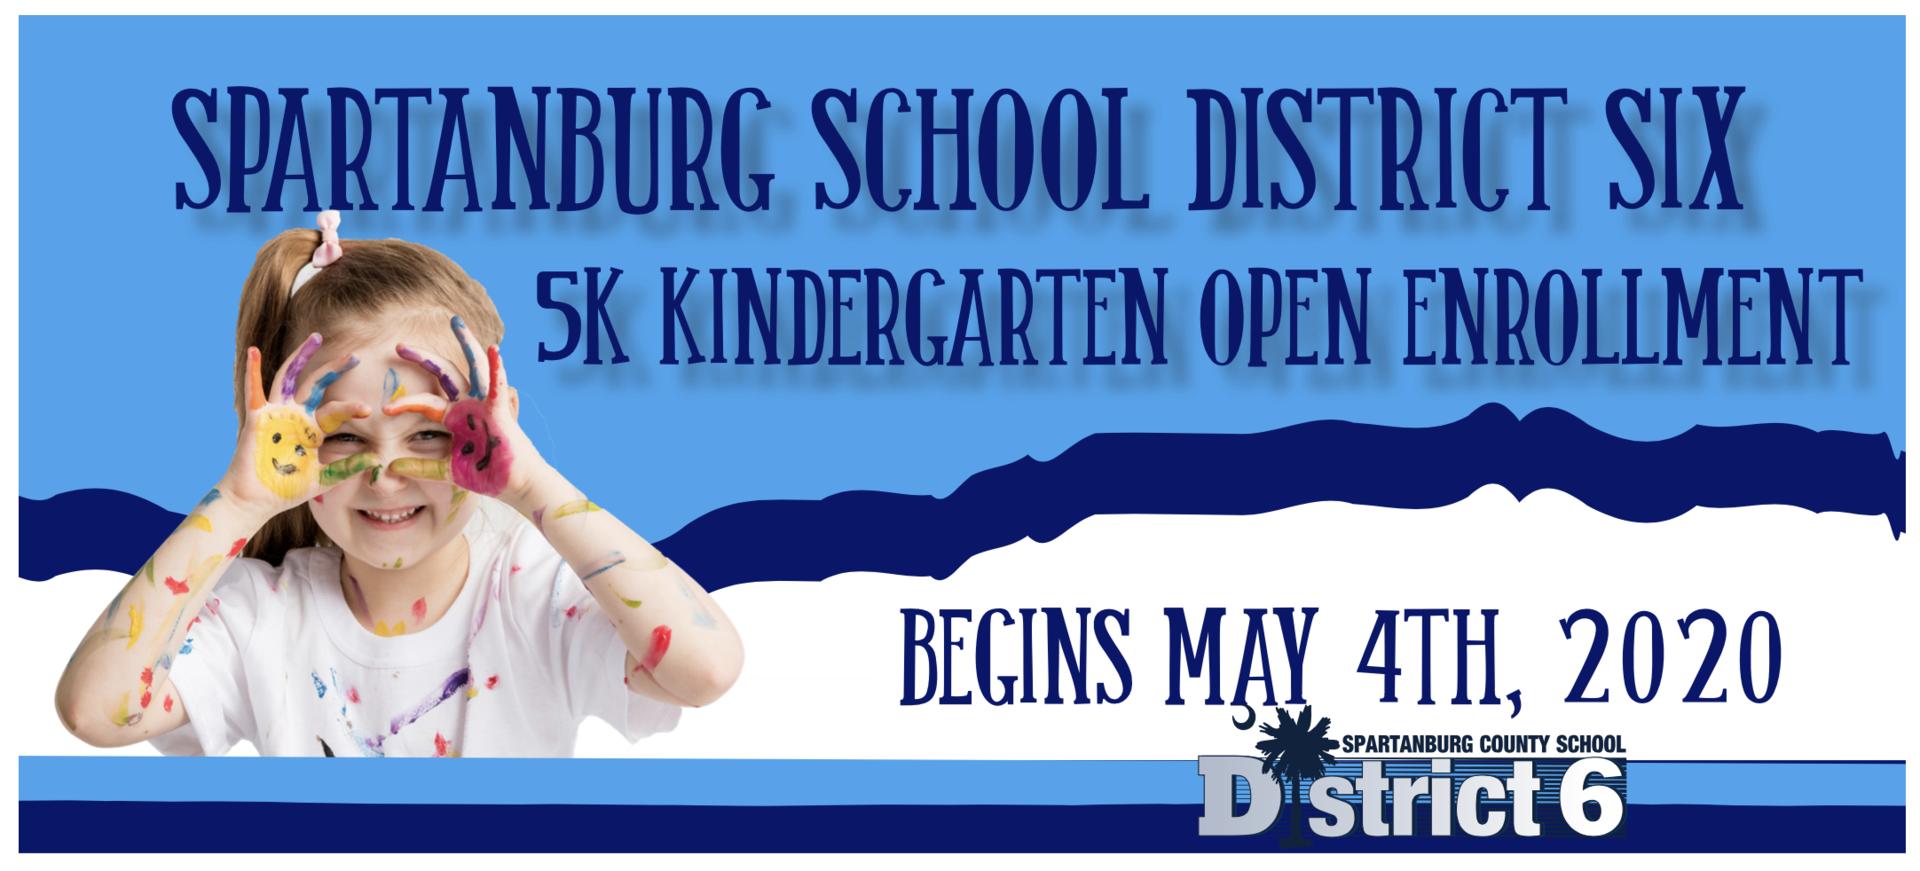 Kindergarten Open Enrollment Starts May4th